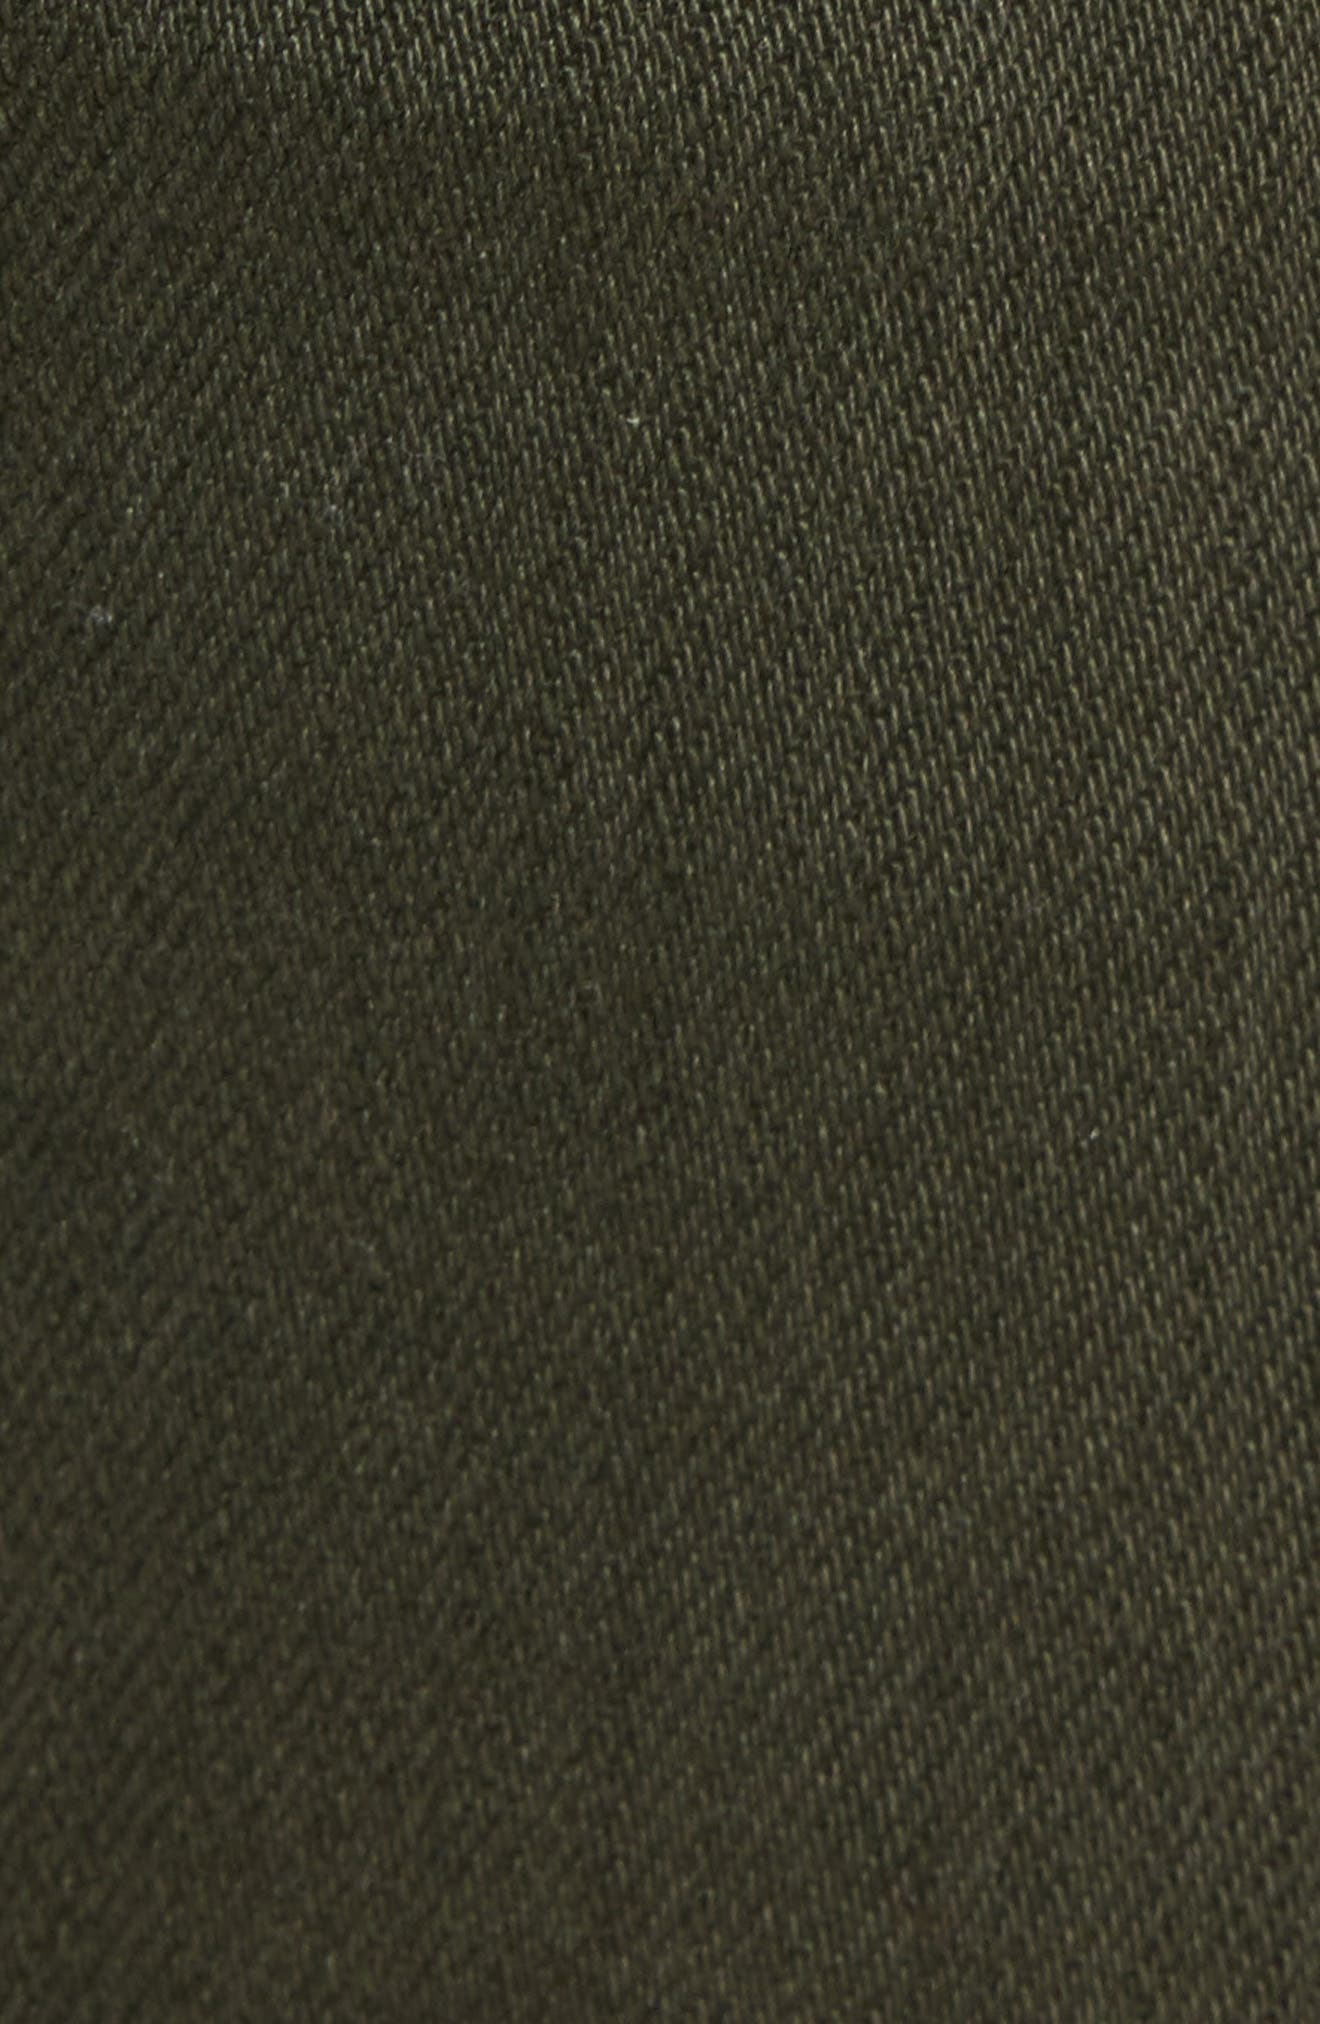 Tellis Slim Fit Jeans,                             Alternate thumbnail 5, color,                             7 YEARS OAK GROVE